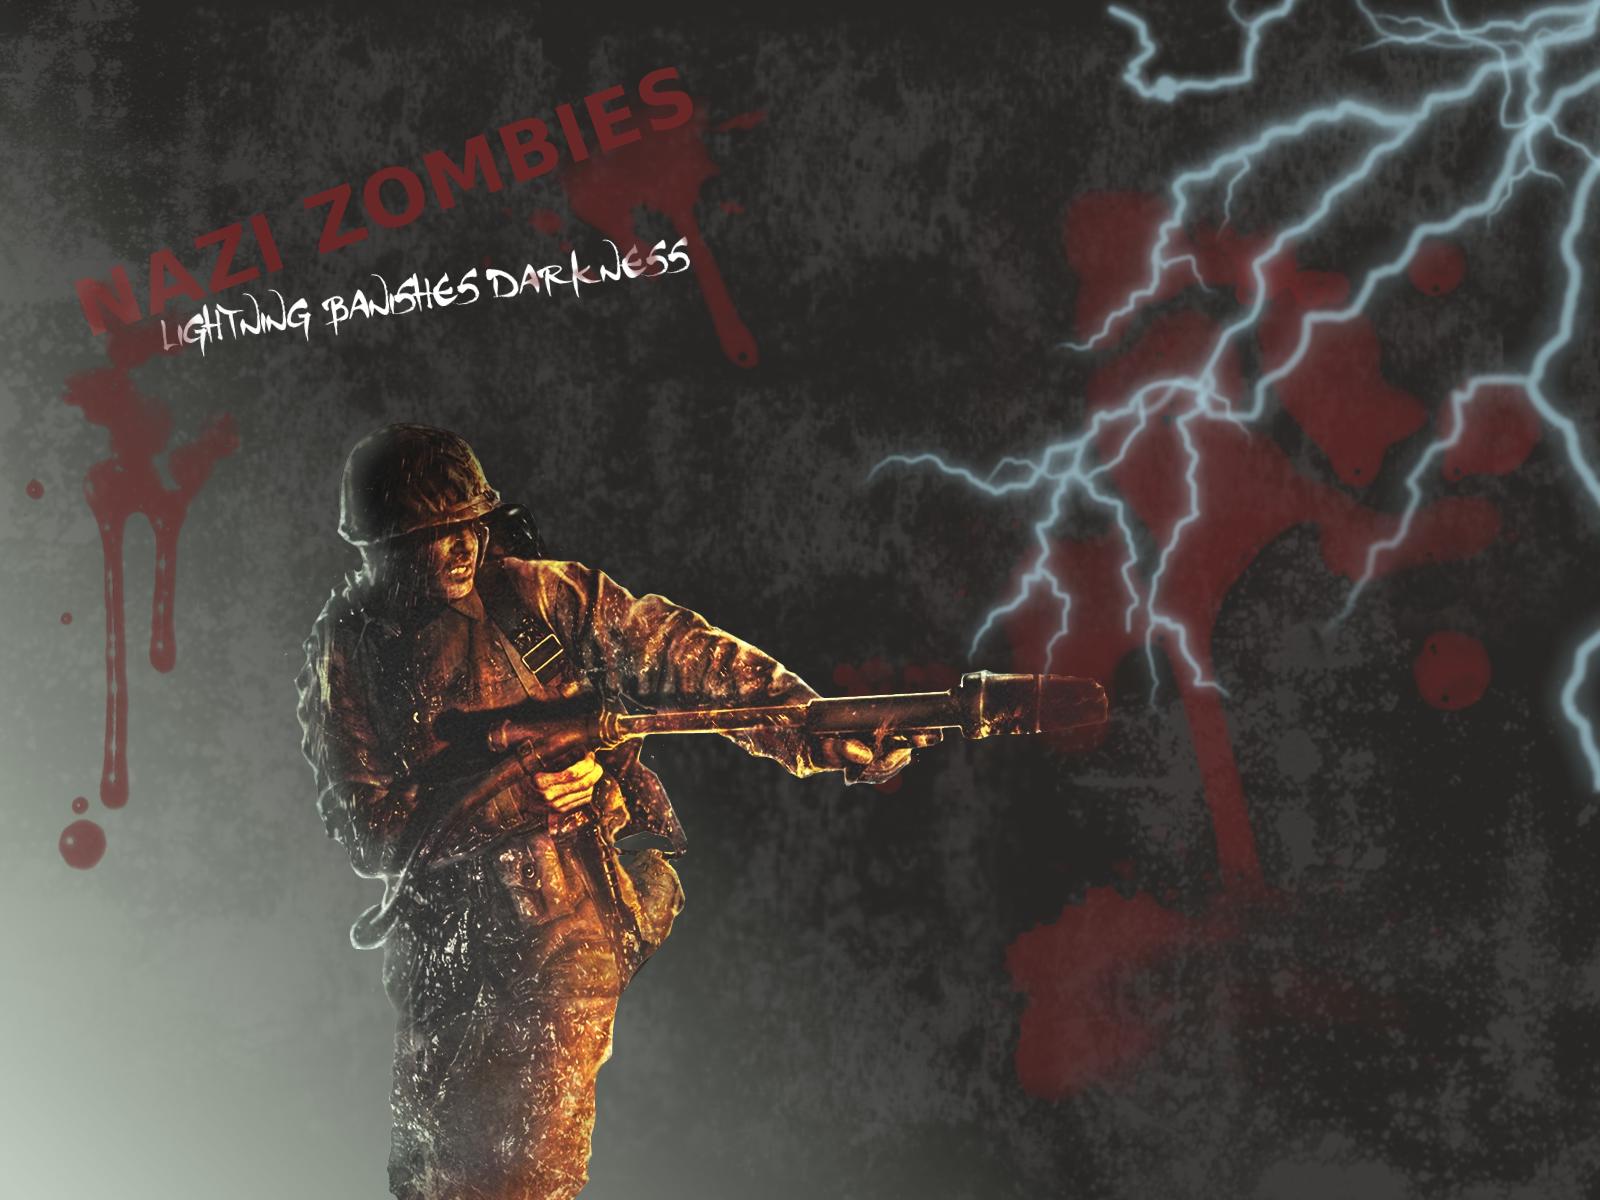 Call Of Duty Nazi Zombies Wallpaper Nazi zombies by dpmm07 1600x1200